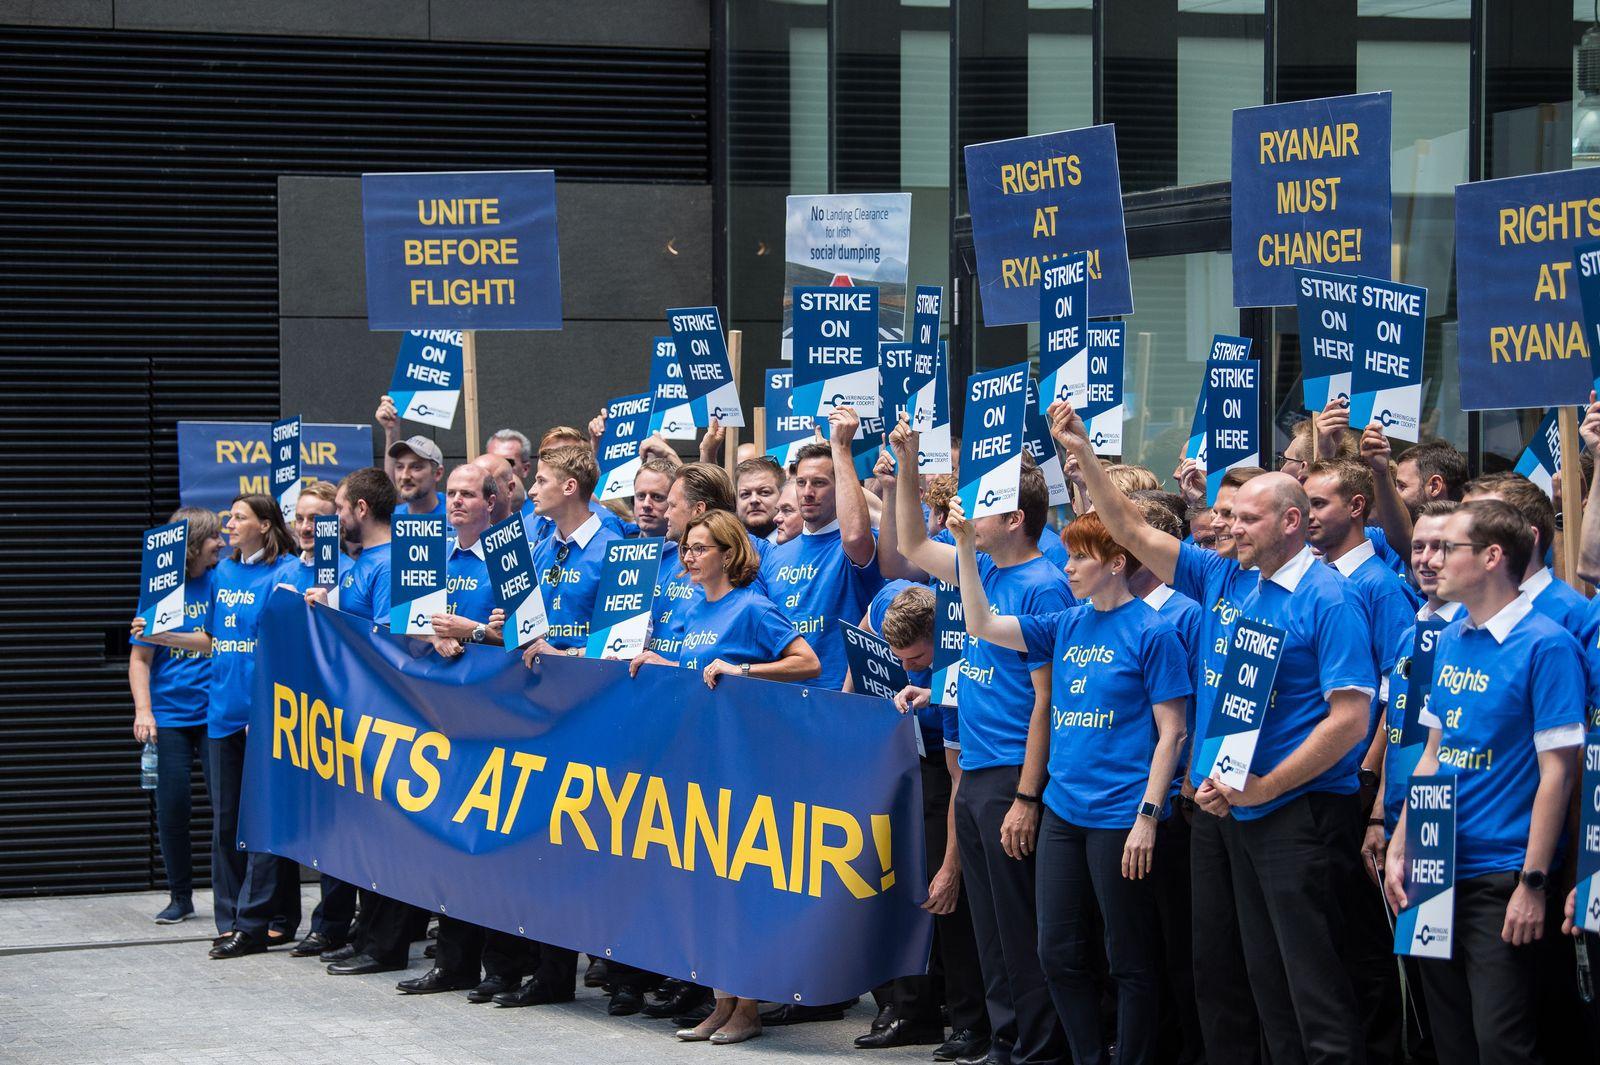 Streik Ryanair - Frankfurt